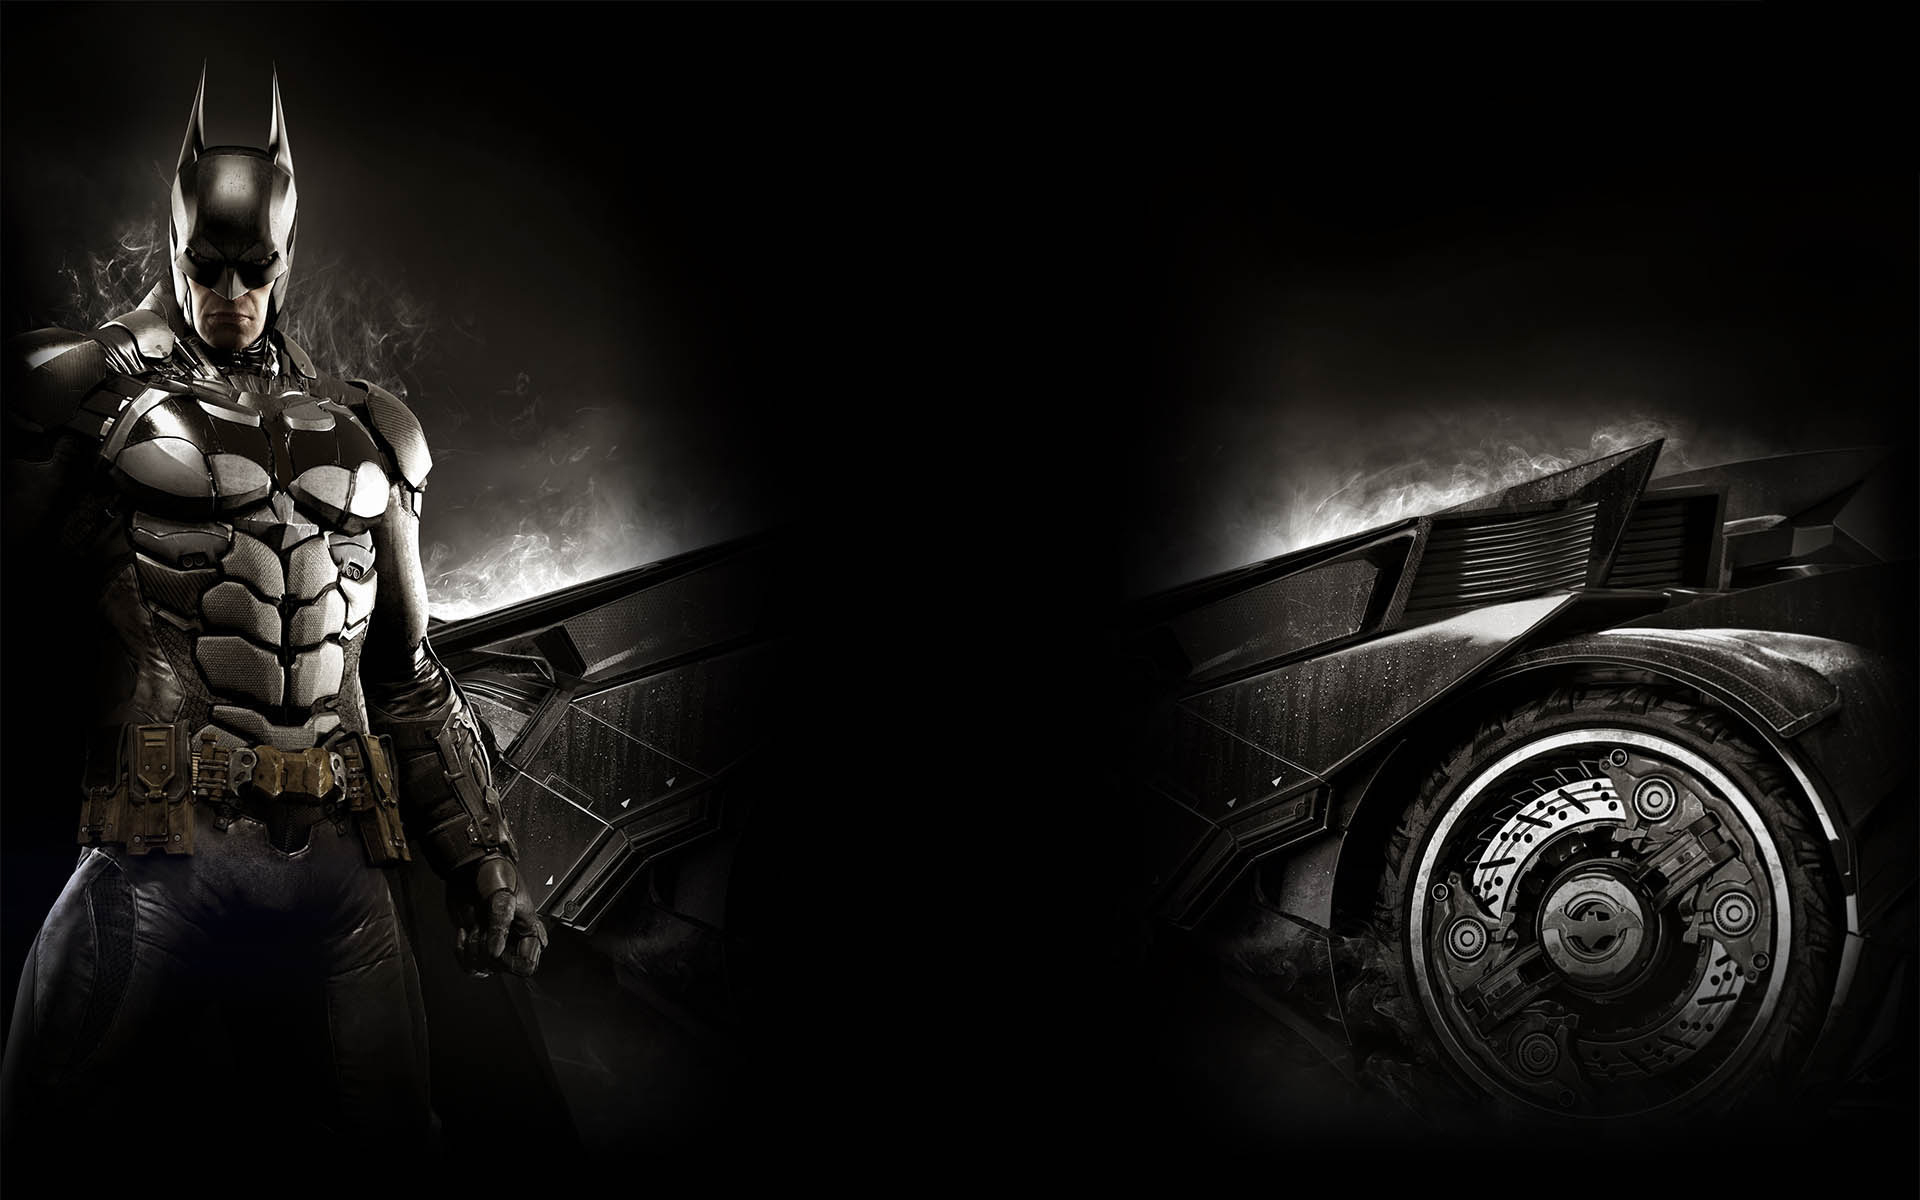 Limited Edition Batman Arkham Knight Hd Wallpaper